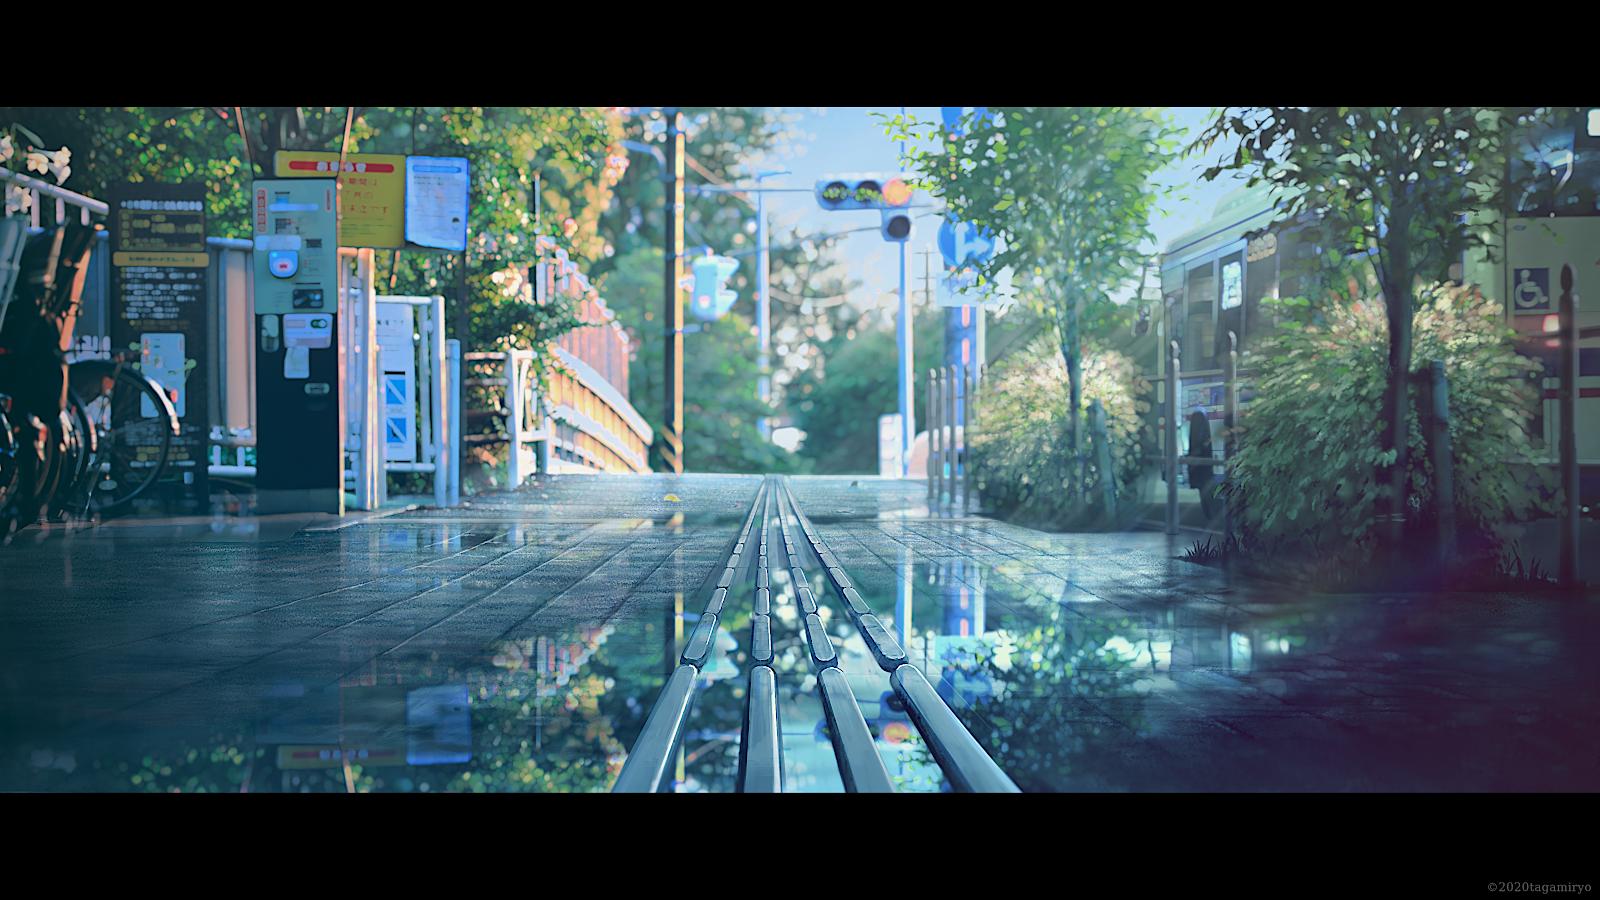 General 1600x900 street rain urban water reflection 2020 (Year) trees traffic signs